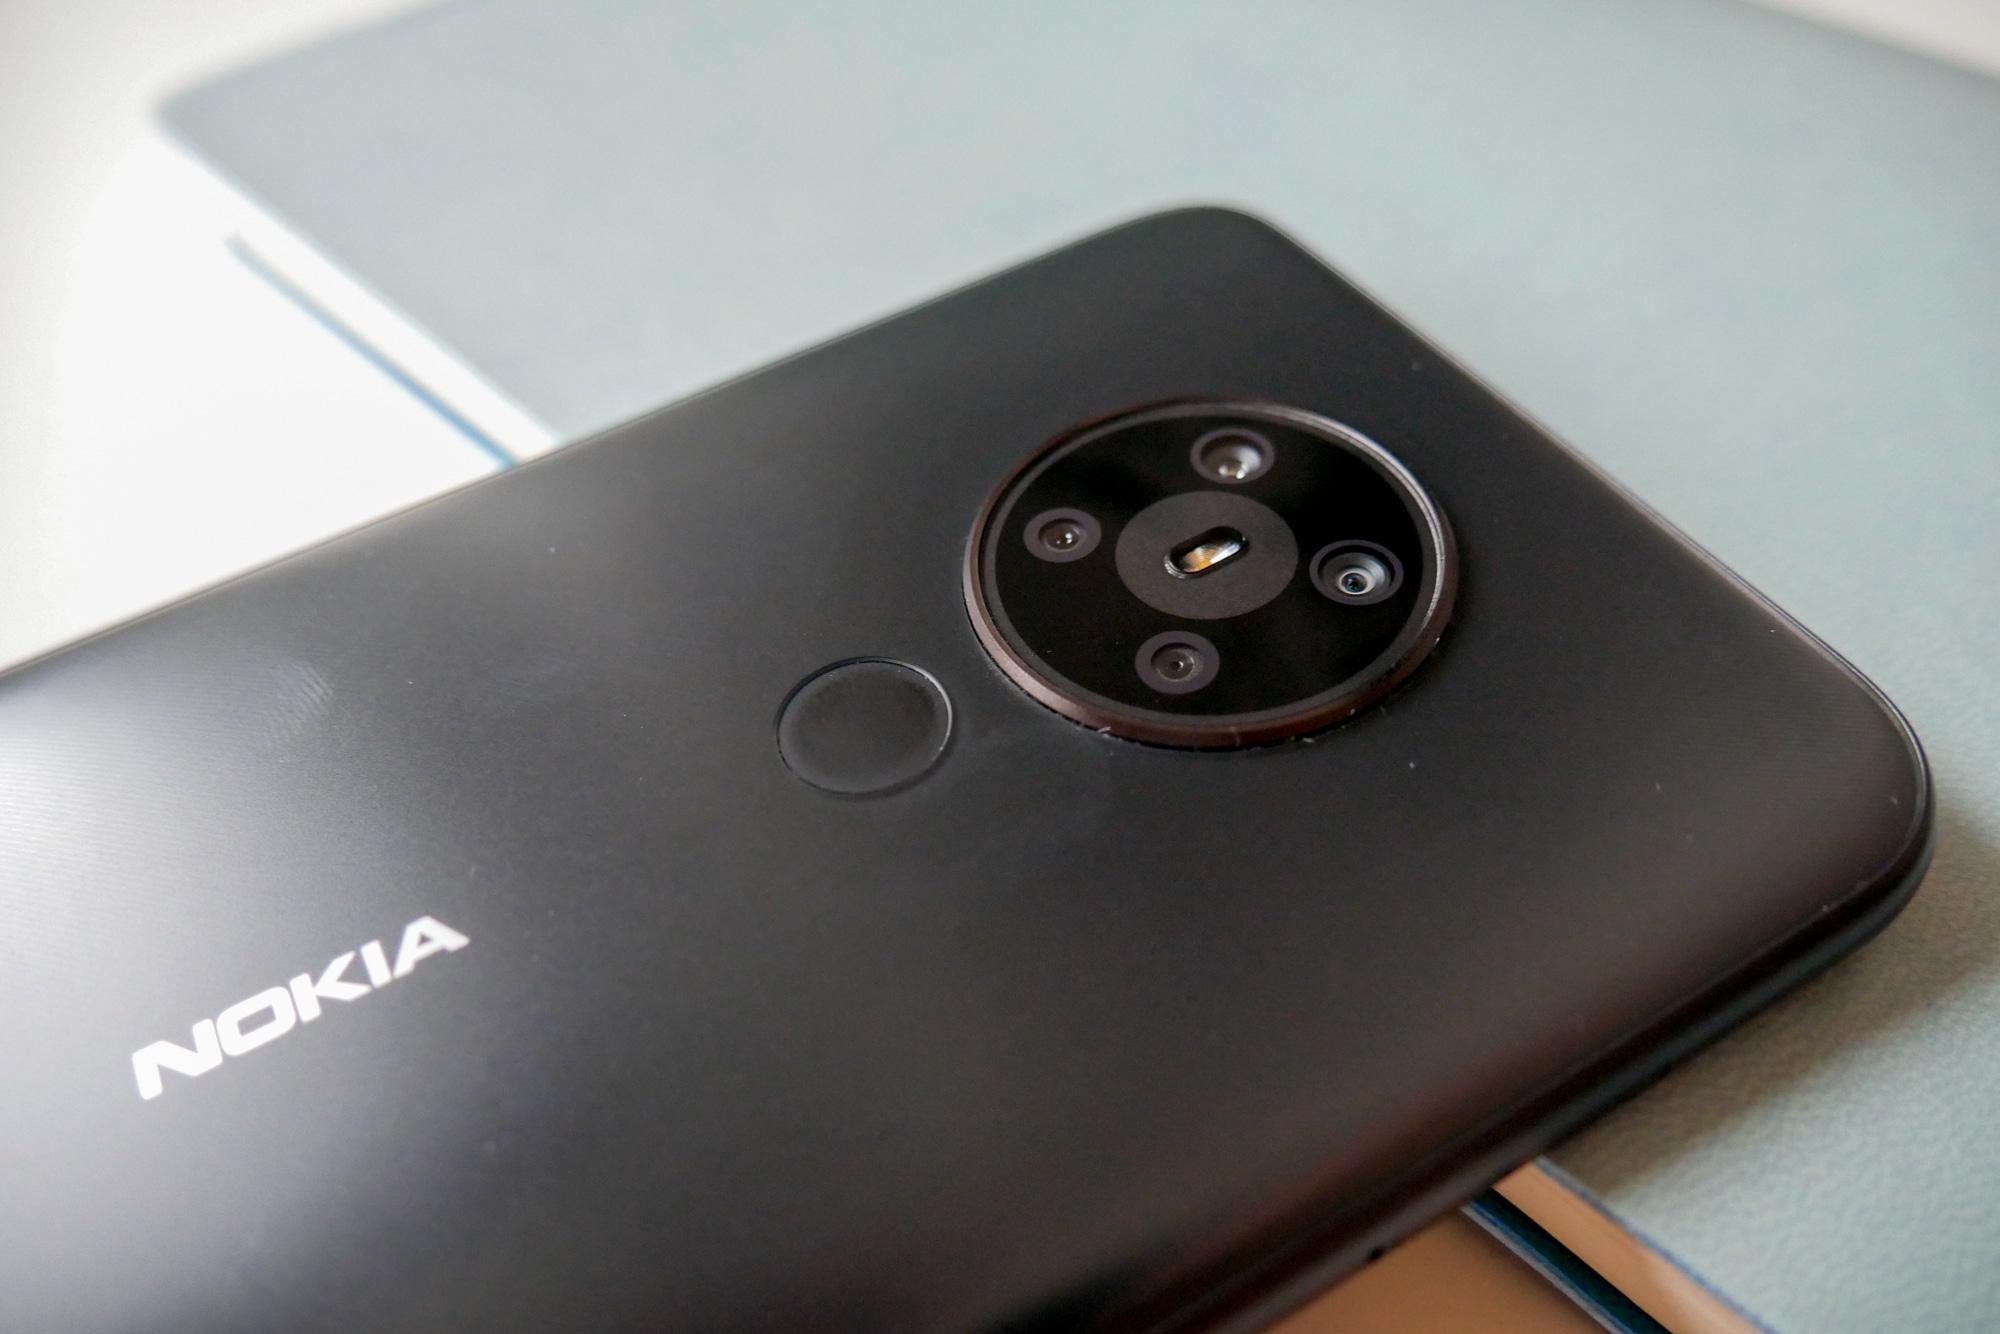 Fingerabdrucksensor des Nokia 5.3.